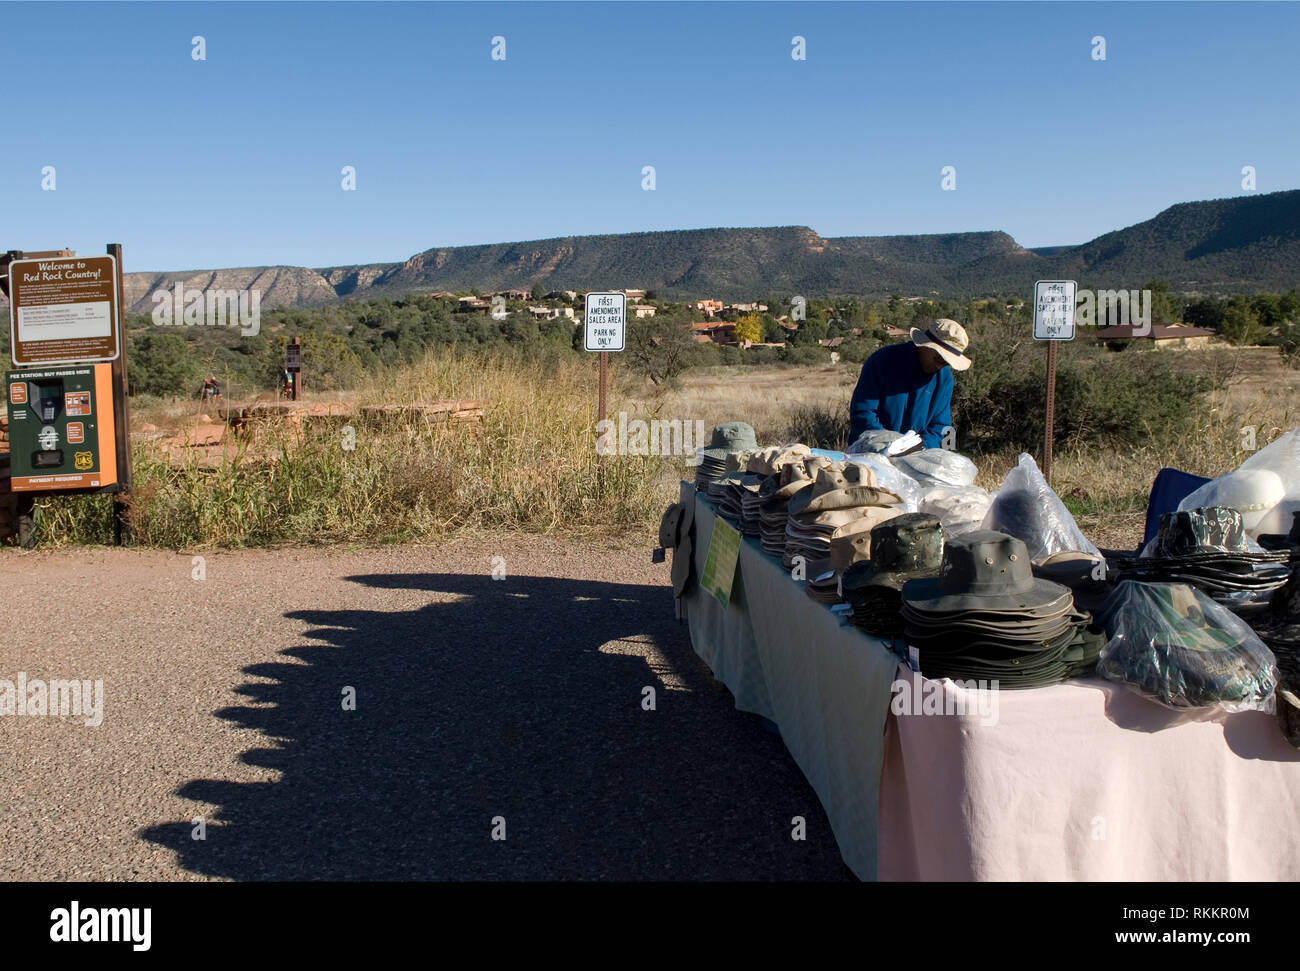 Vendor sells hats at Bell Rock Pathway, Sedona Arizona USA - Stock Image